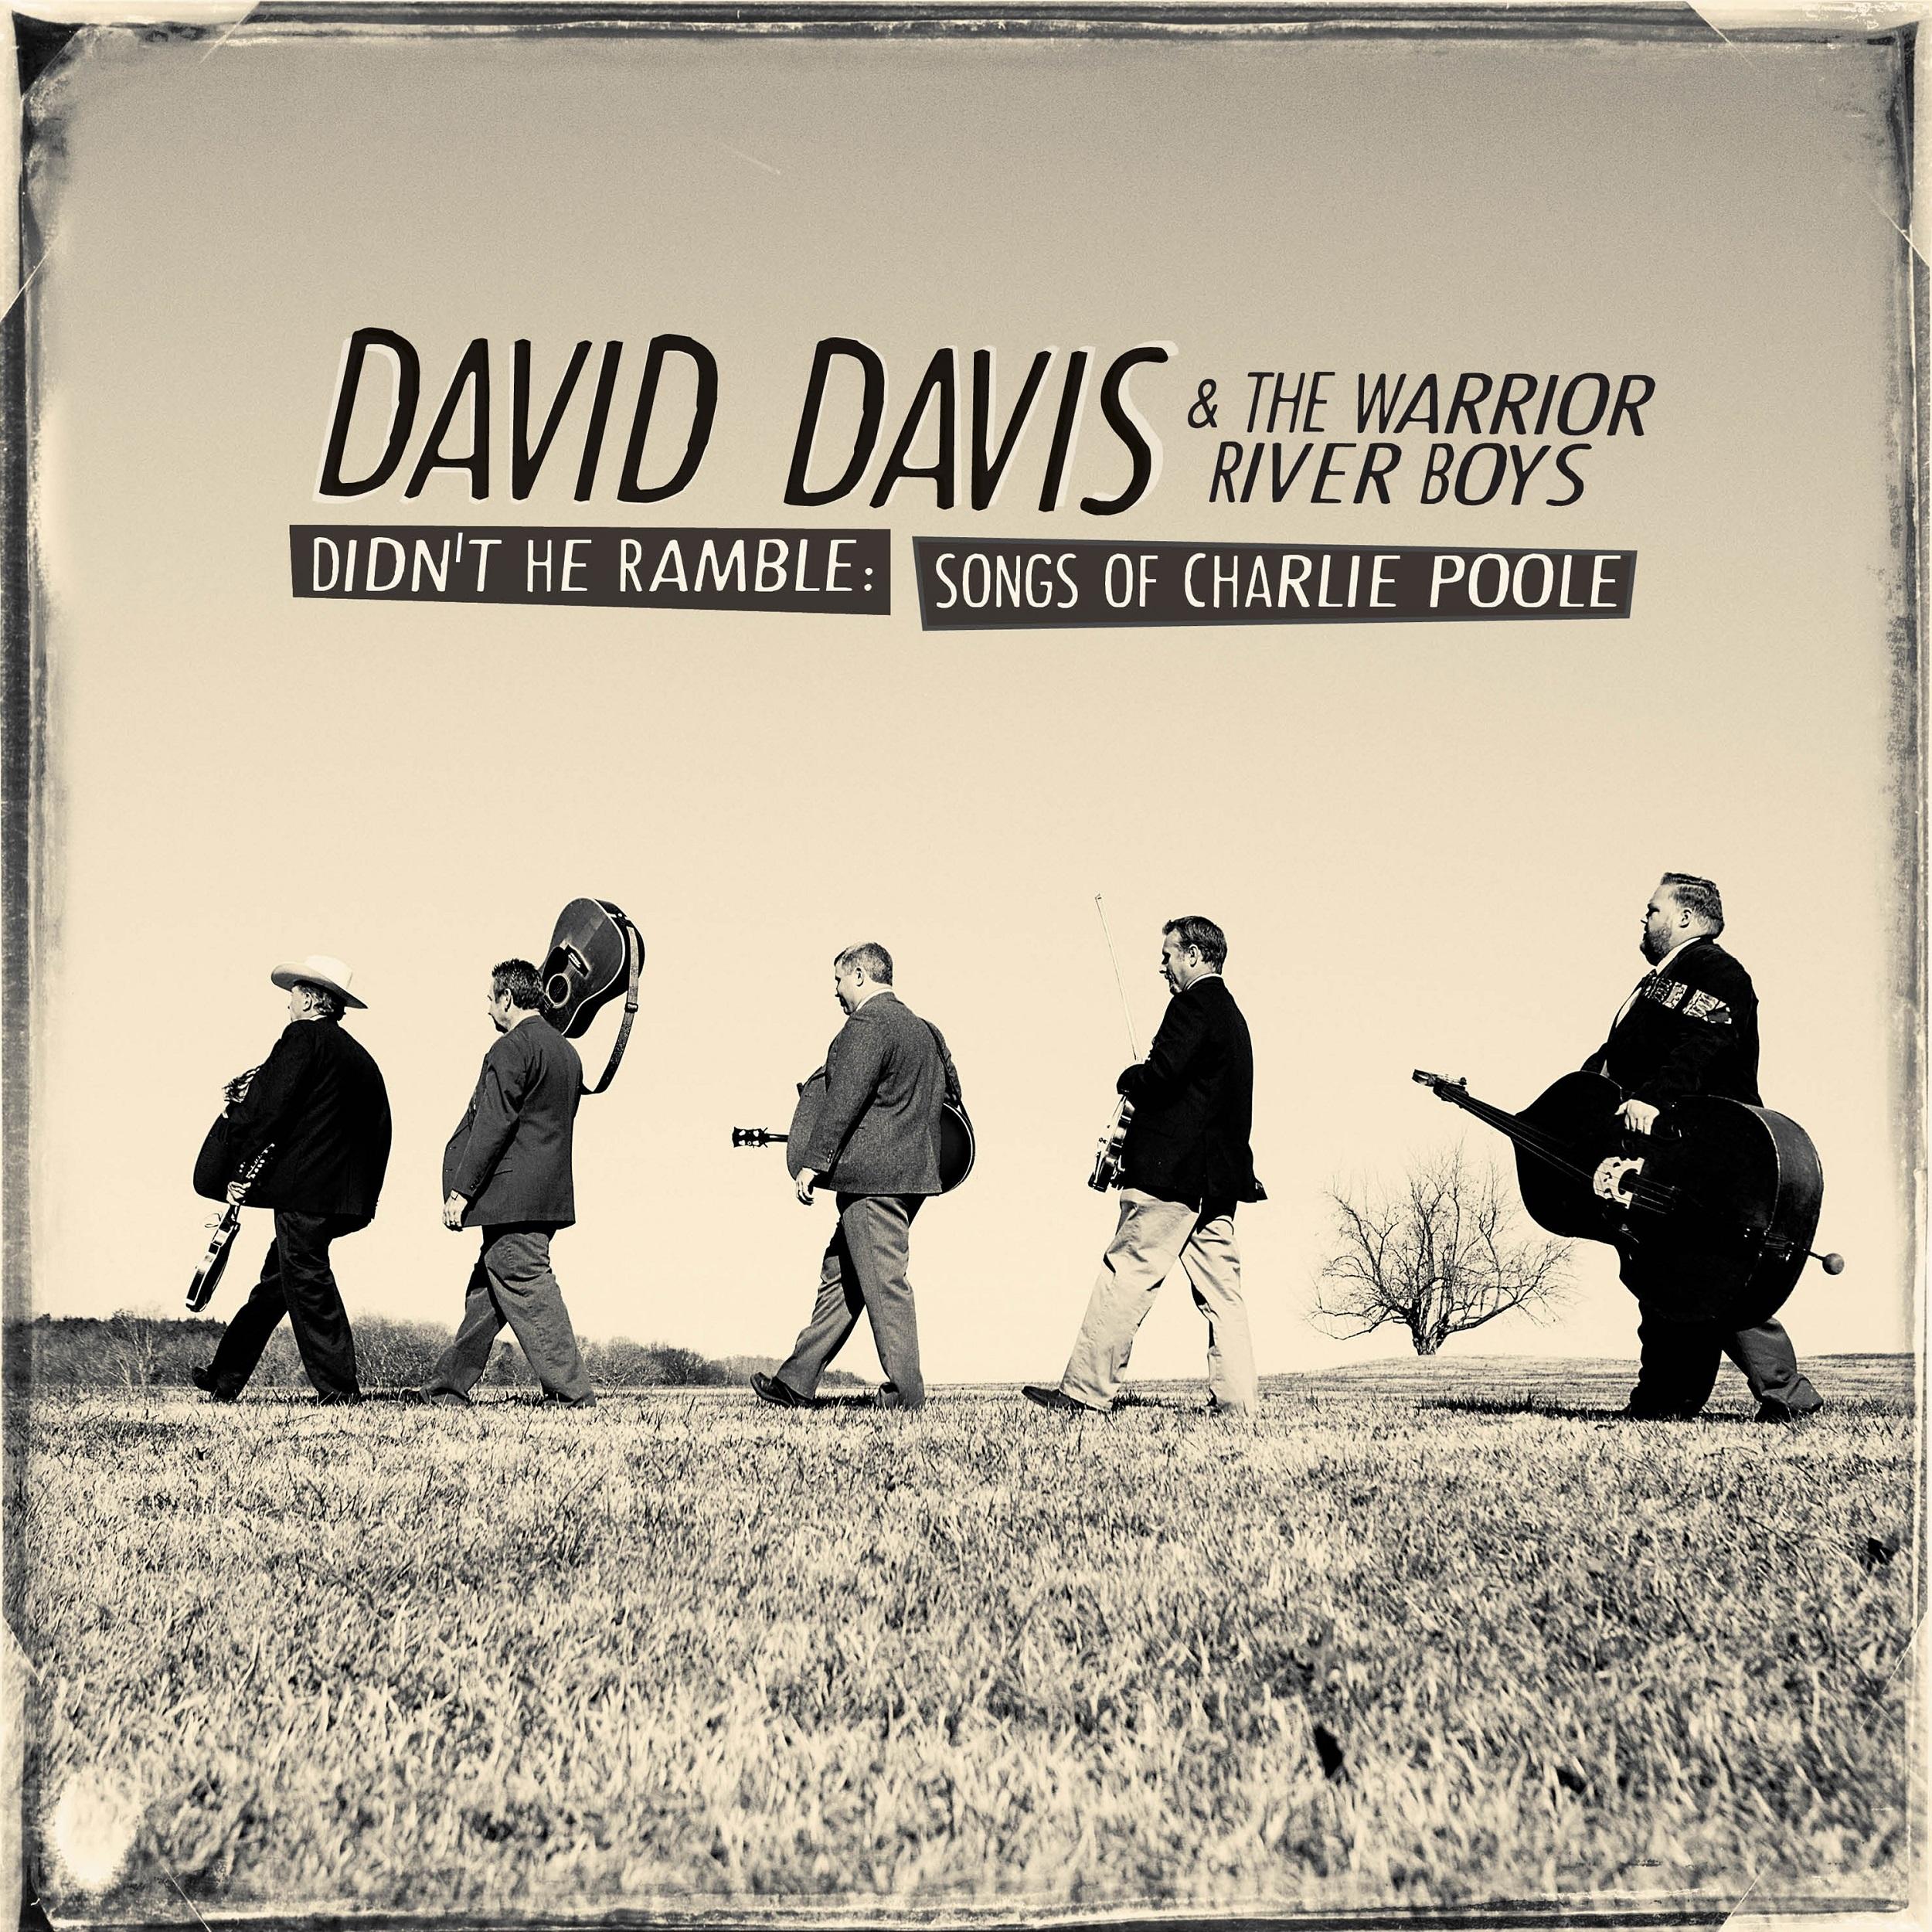 STREAM: David Davis & The Warrior River Boys, 'Didn't He Ramble: Songs of Charlie Poole'